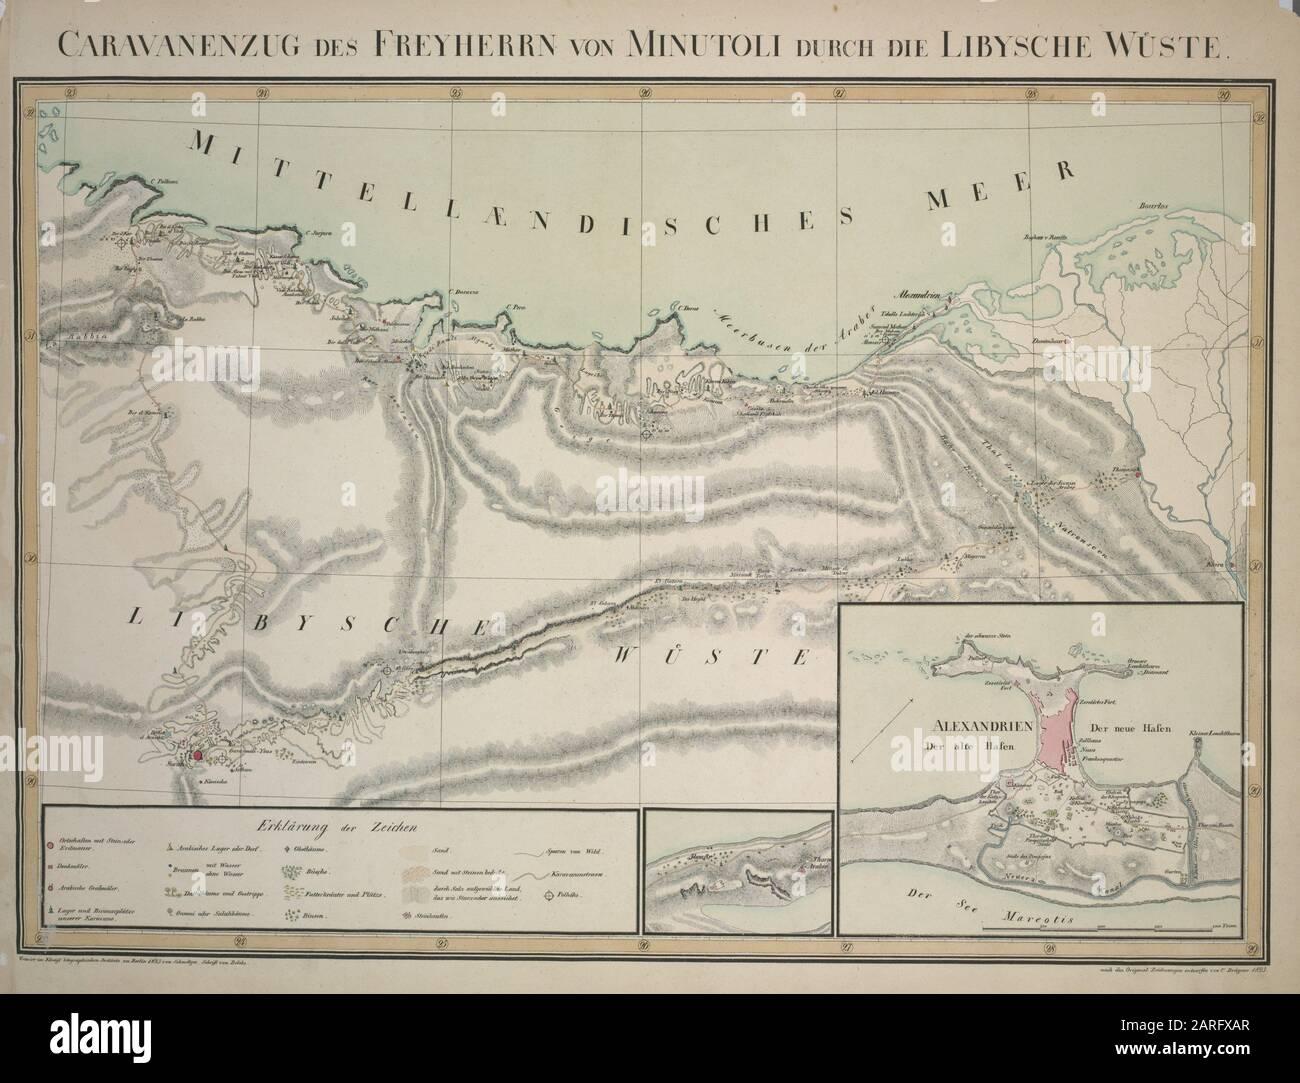 Caravan train of the Freyherr von Minutoli through the Libyan desert. Minutoli, Johann Heinrich Carl, baron of (1772-1846) (Author). Journey to the Stock Photo